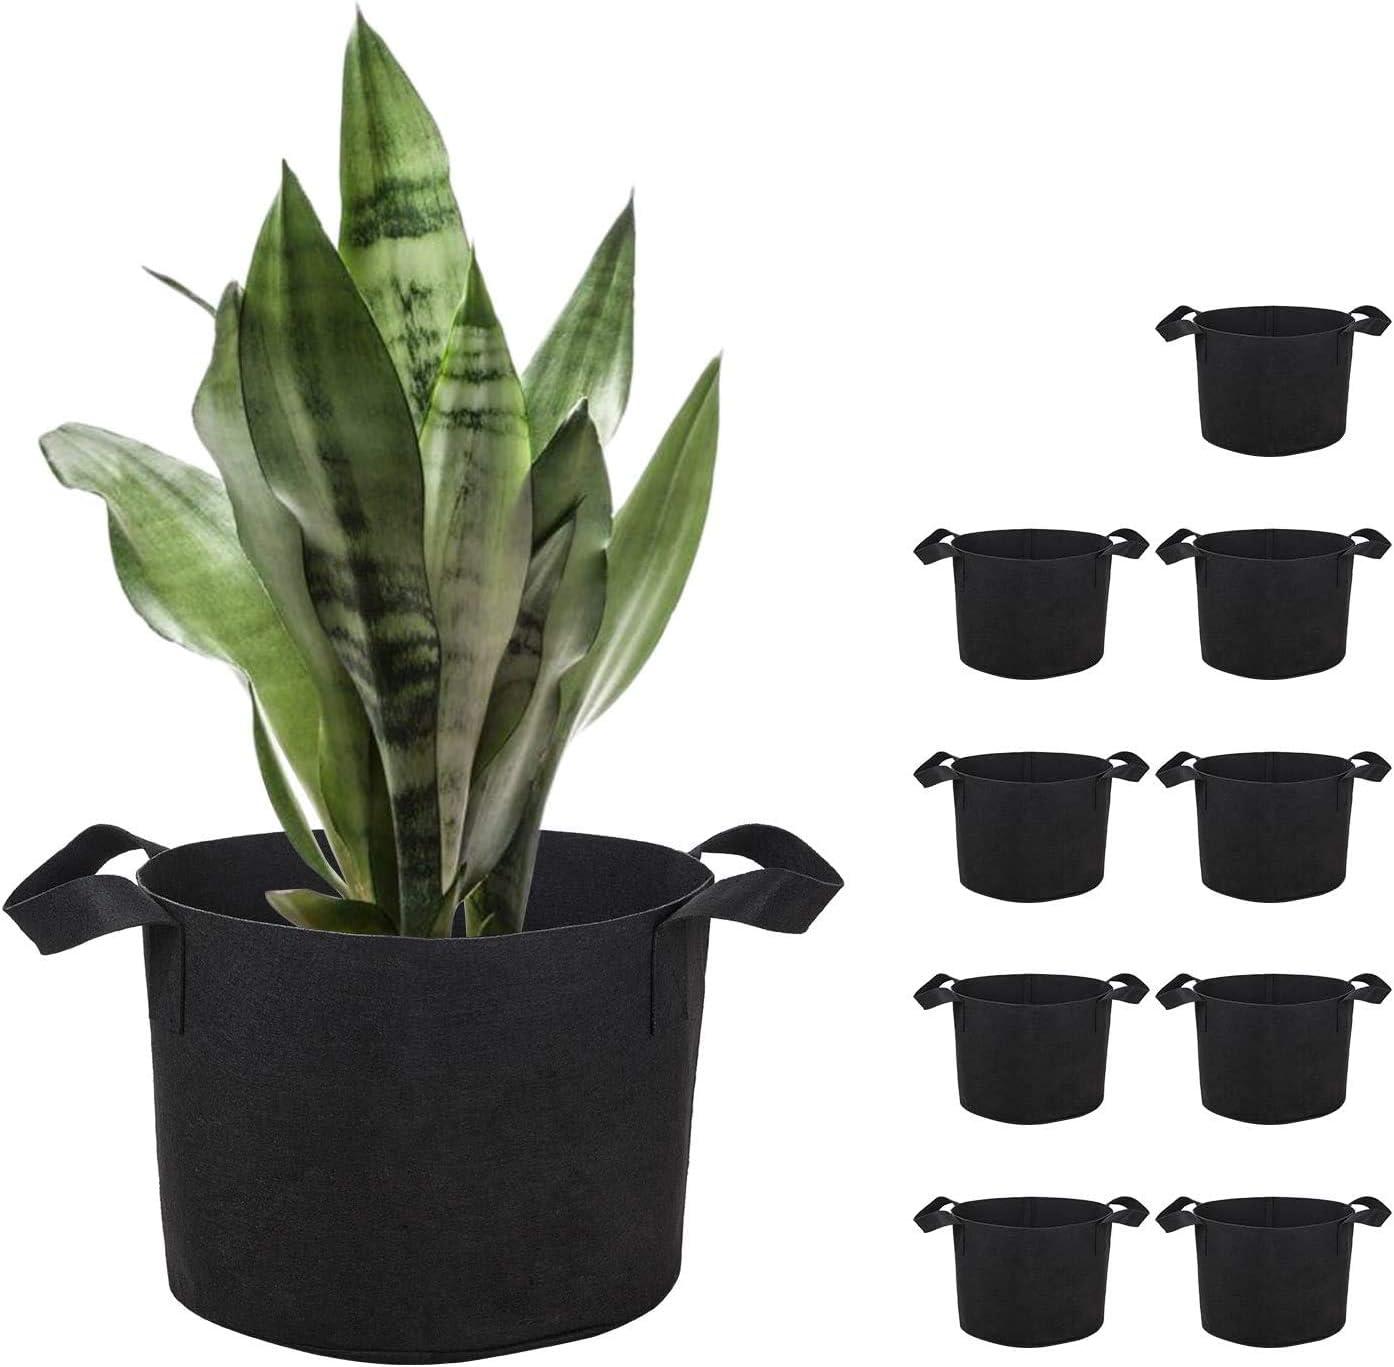 Brajttt 10 Gallon Grow Bags Set, Aeration Fabric Pots with Handles,Black Plant Bags,Durable Garden Grow Pots,Fabric Containers with Strap Handles 10 Pack